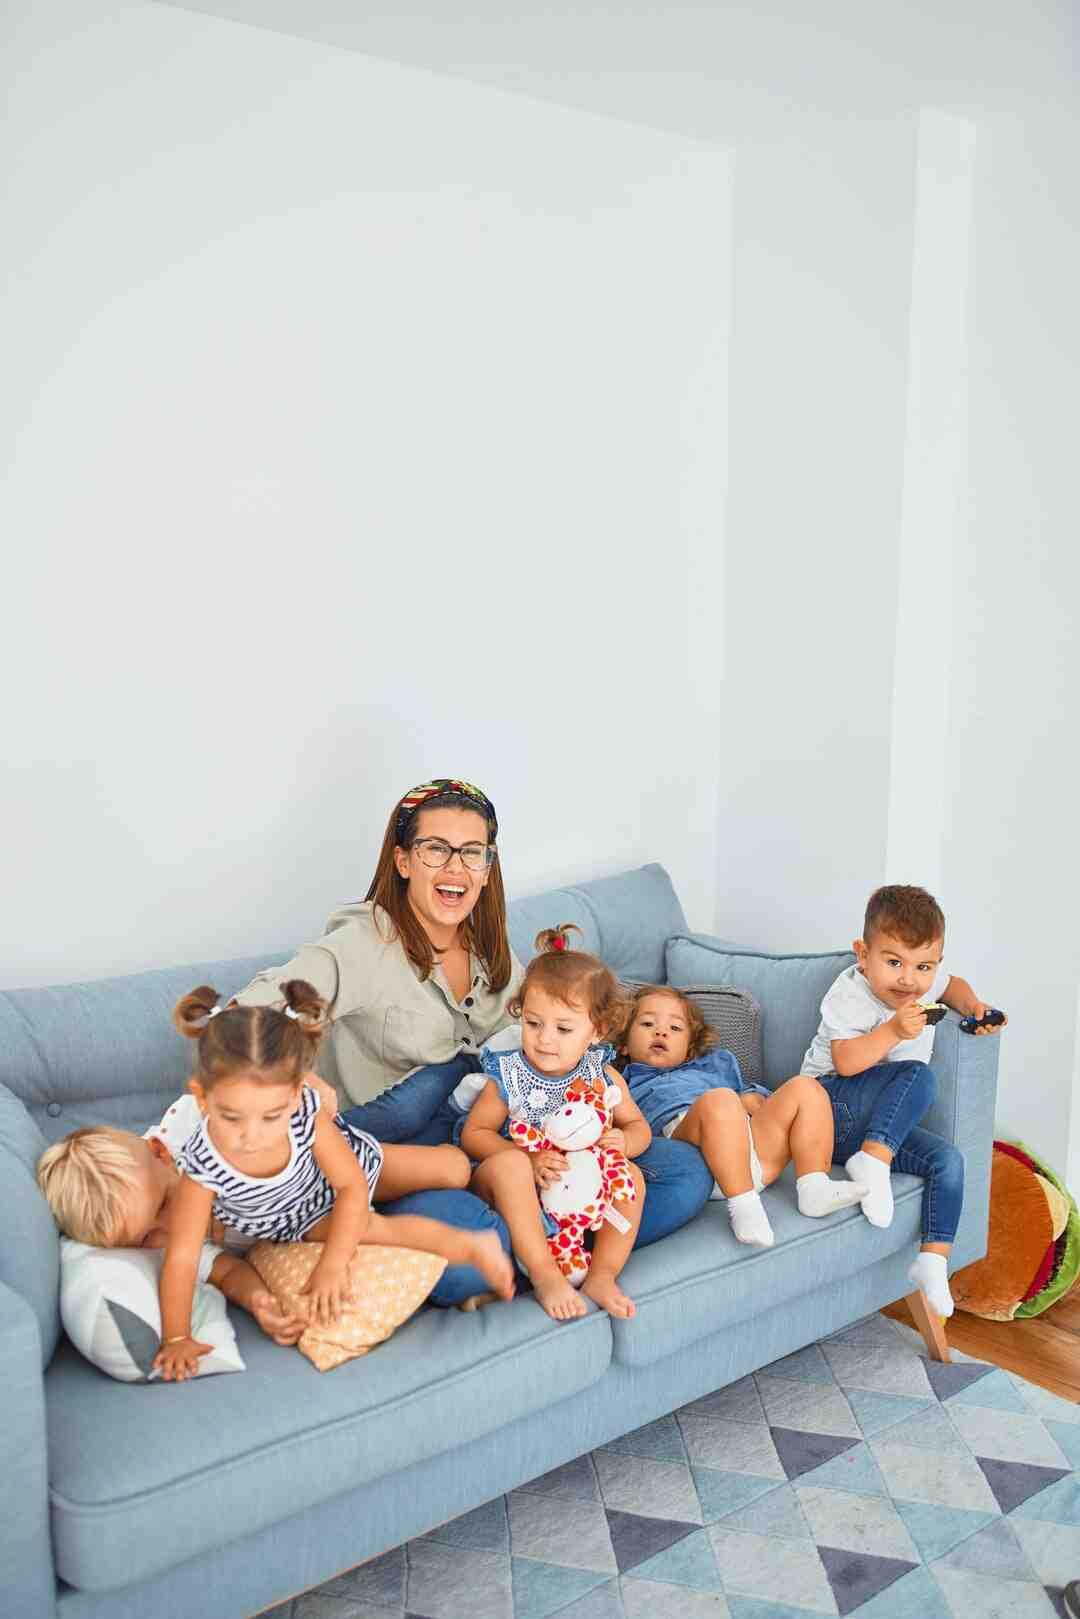 How does parenting affect children's behaviour